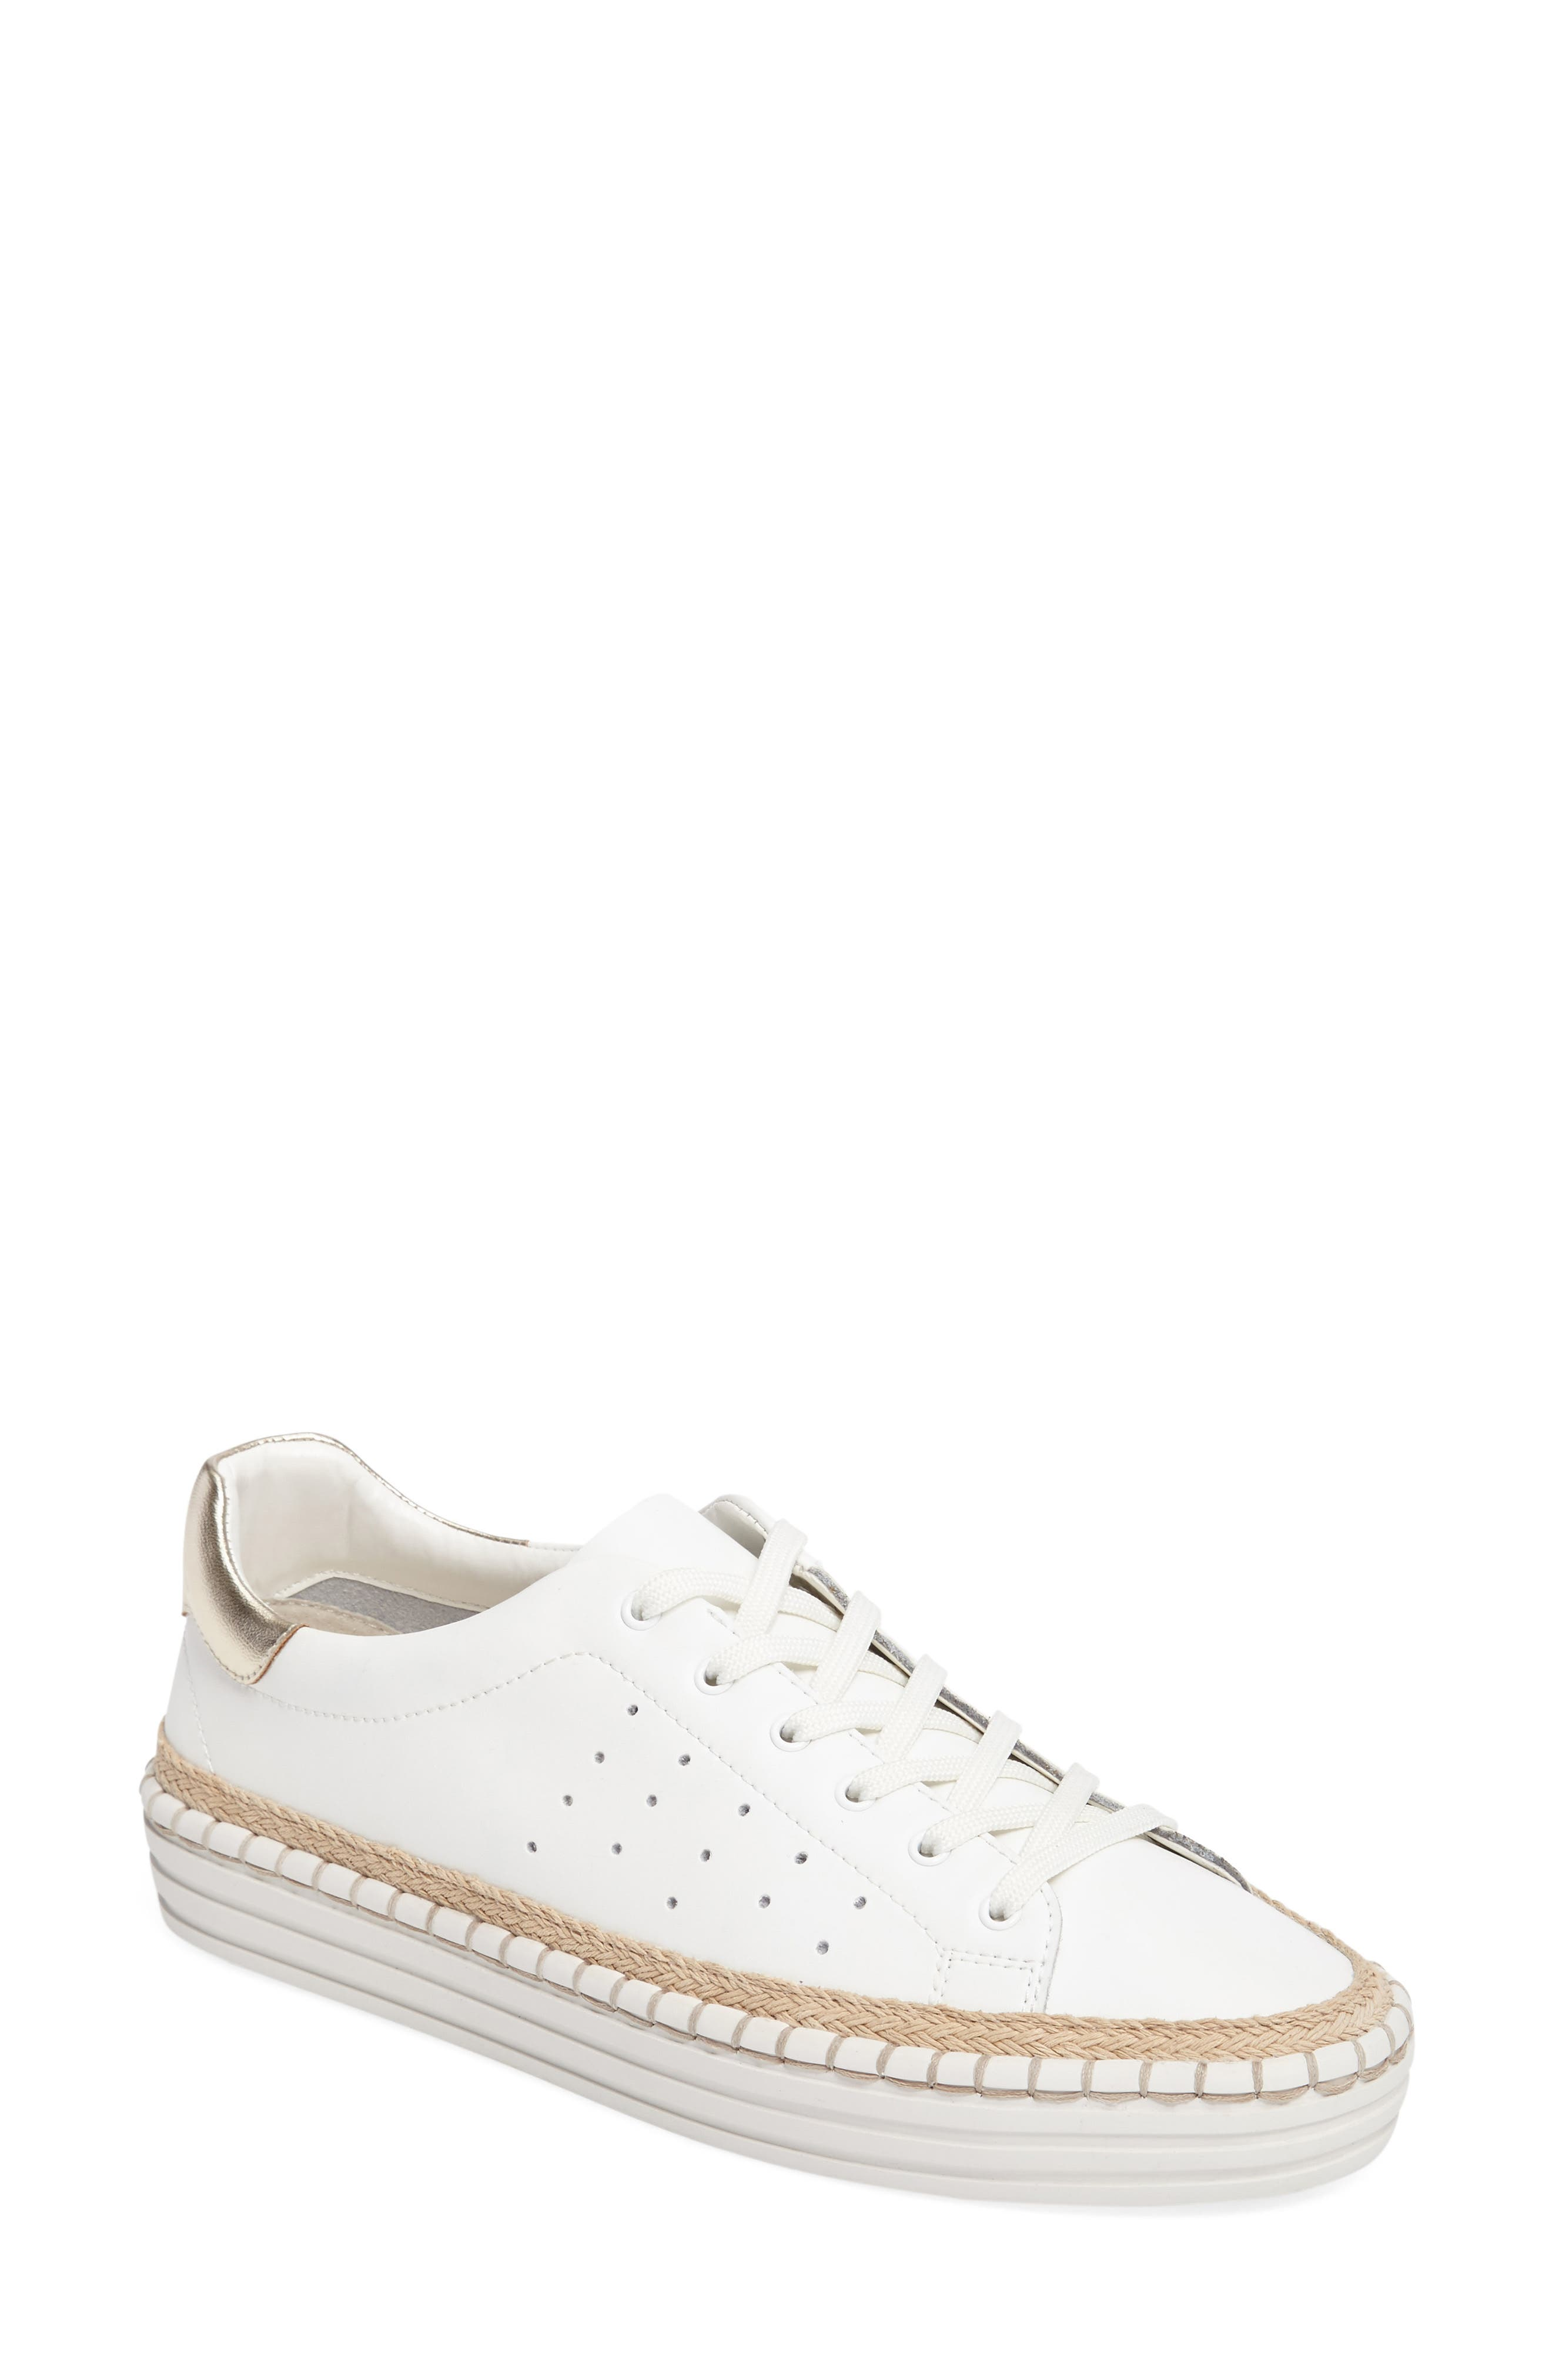 Kavi Sneaker, Main, color, 100